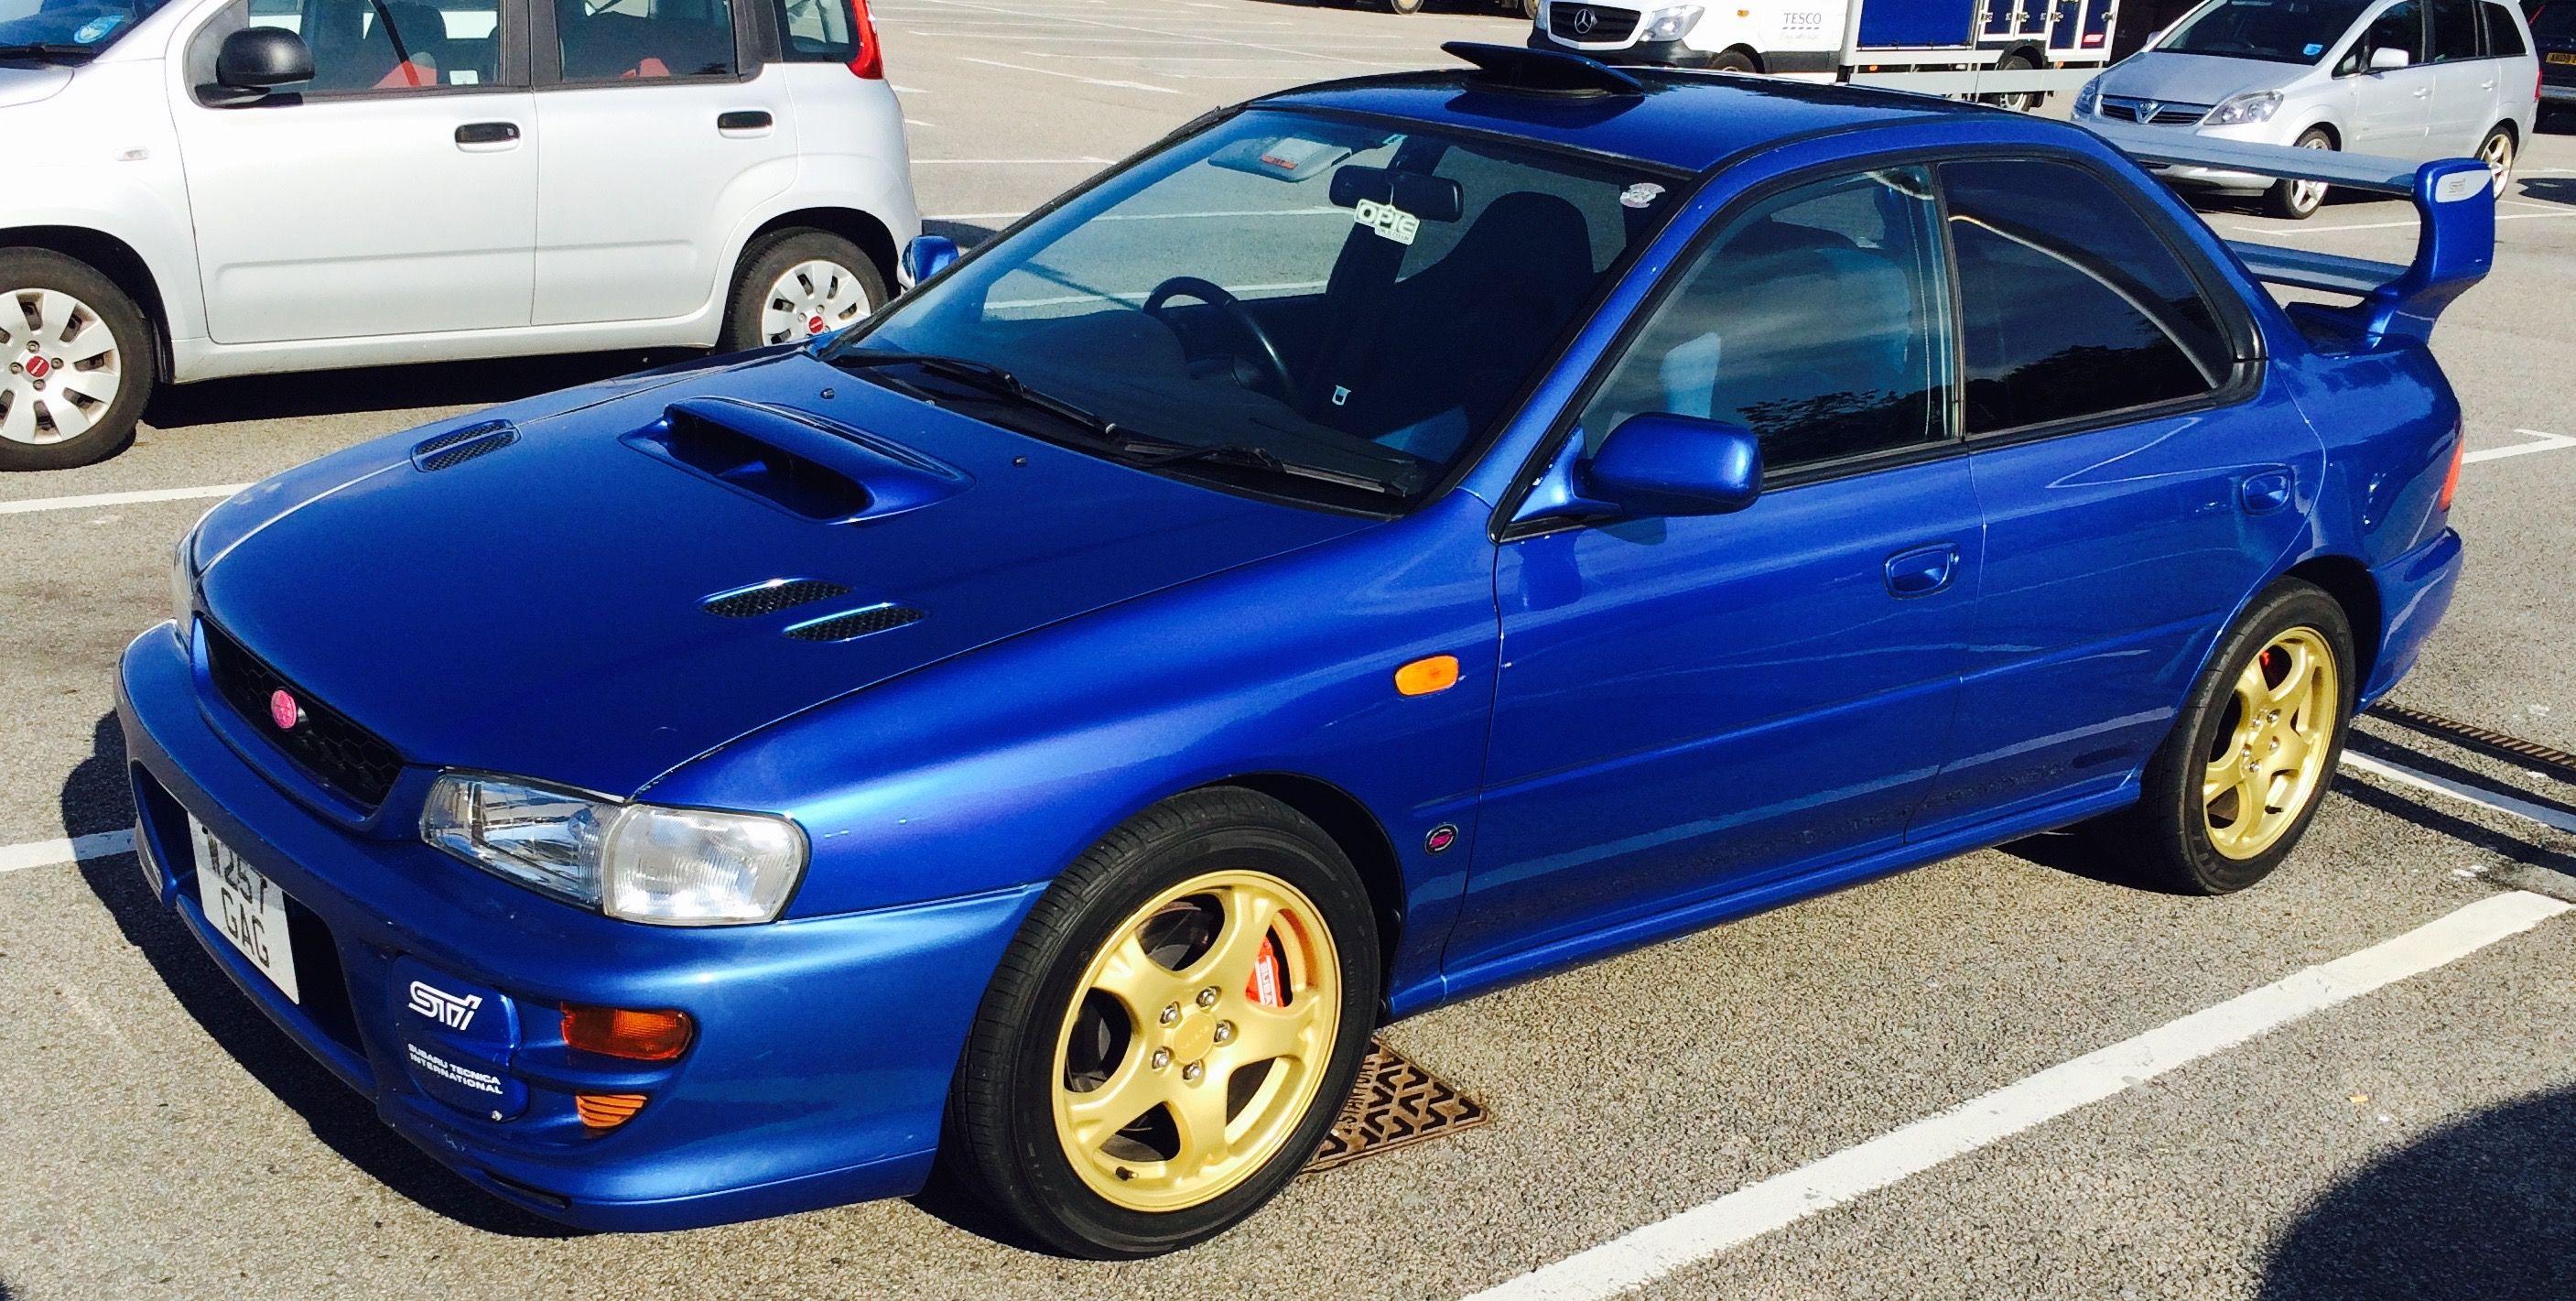 Subaru wrx sti type ra v6 limited